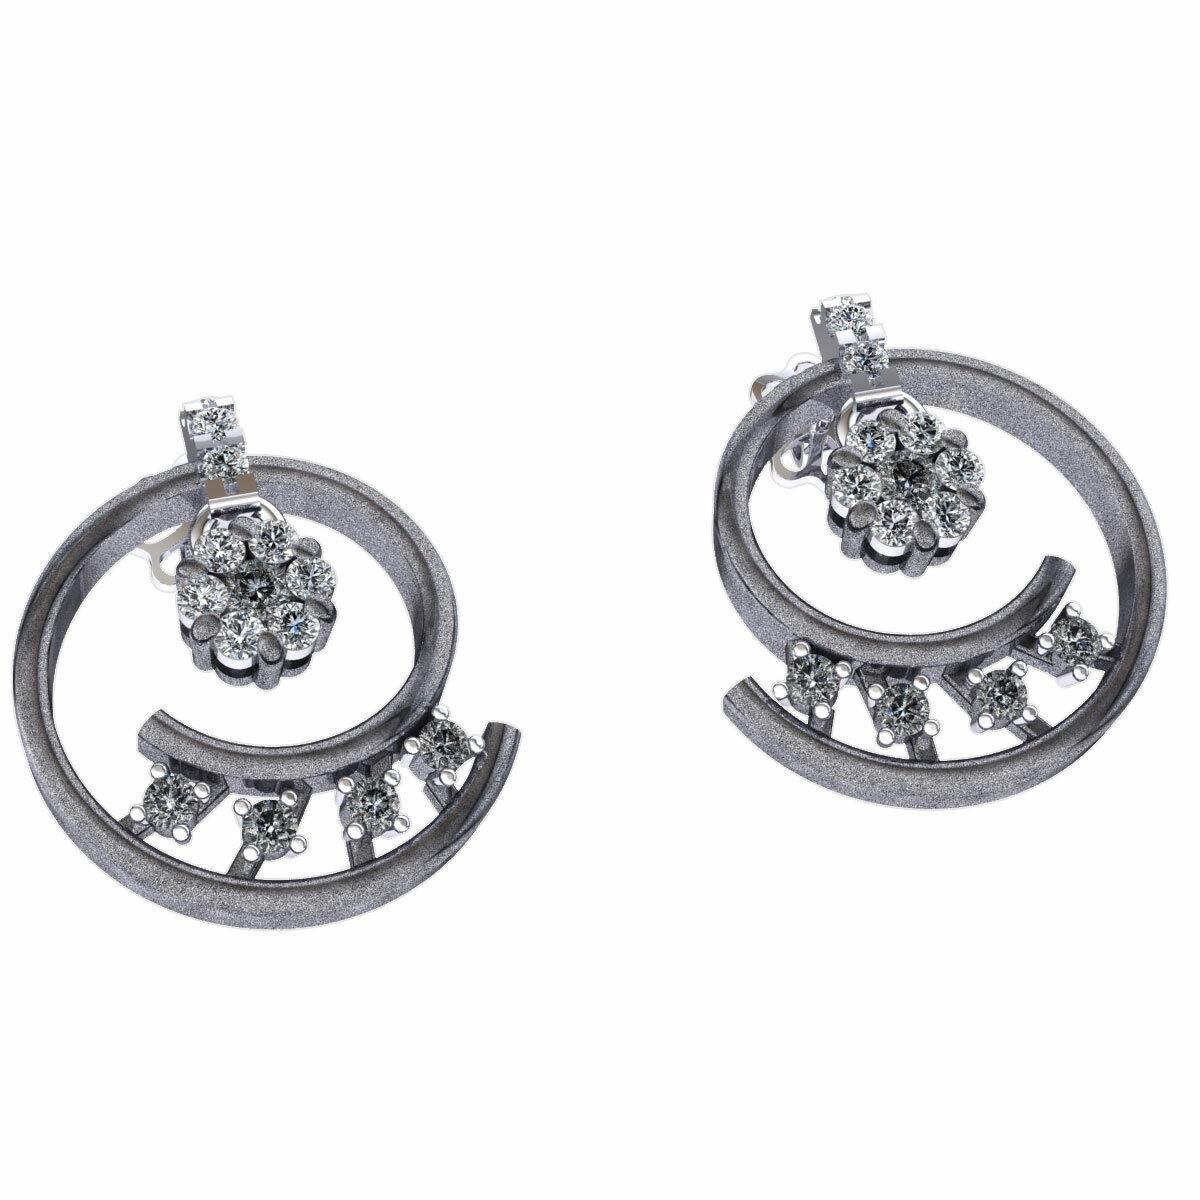 Real 0.4carat Round Cut Diamond Ladies Swirl Flower Earrings Solid 14K gold